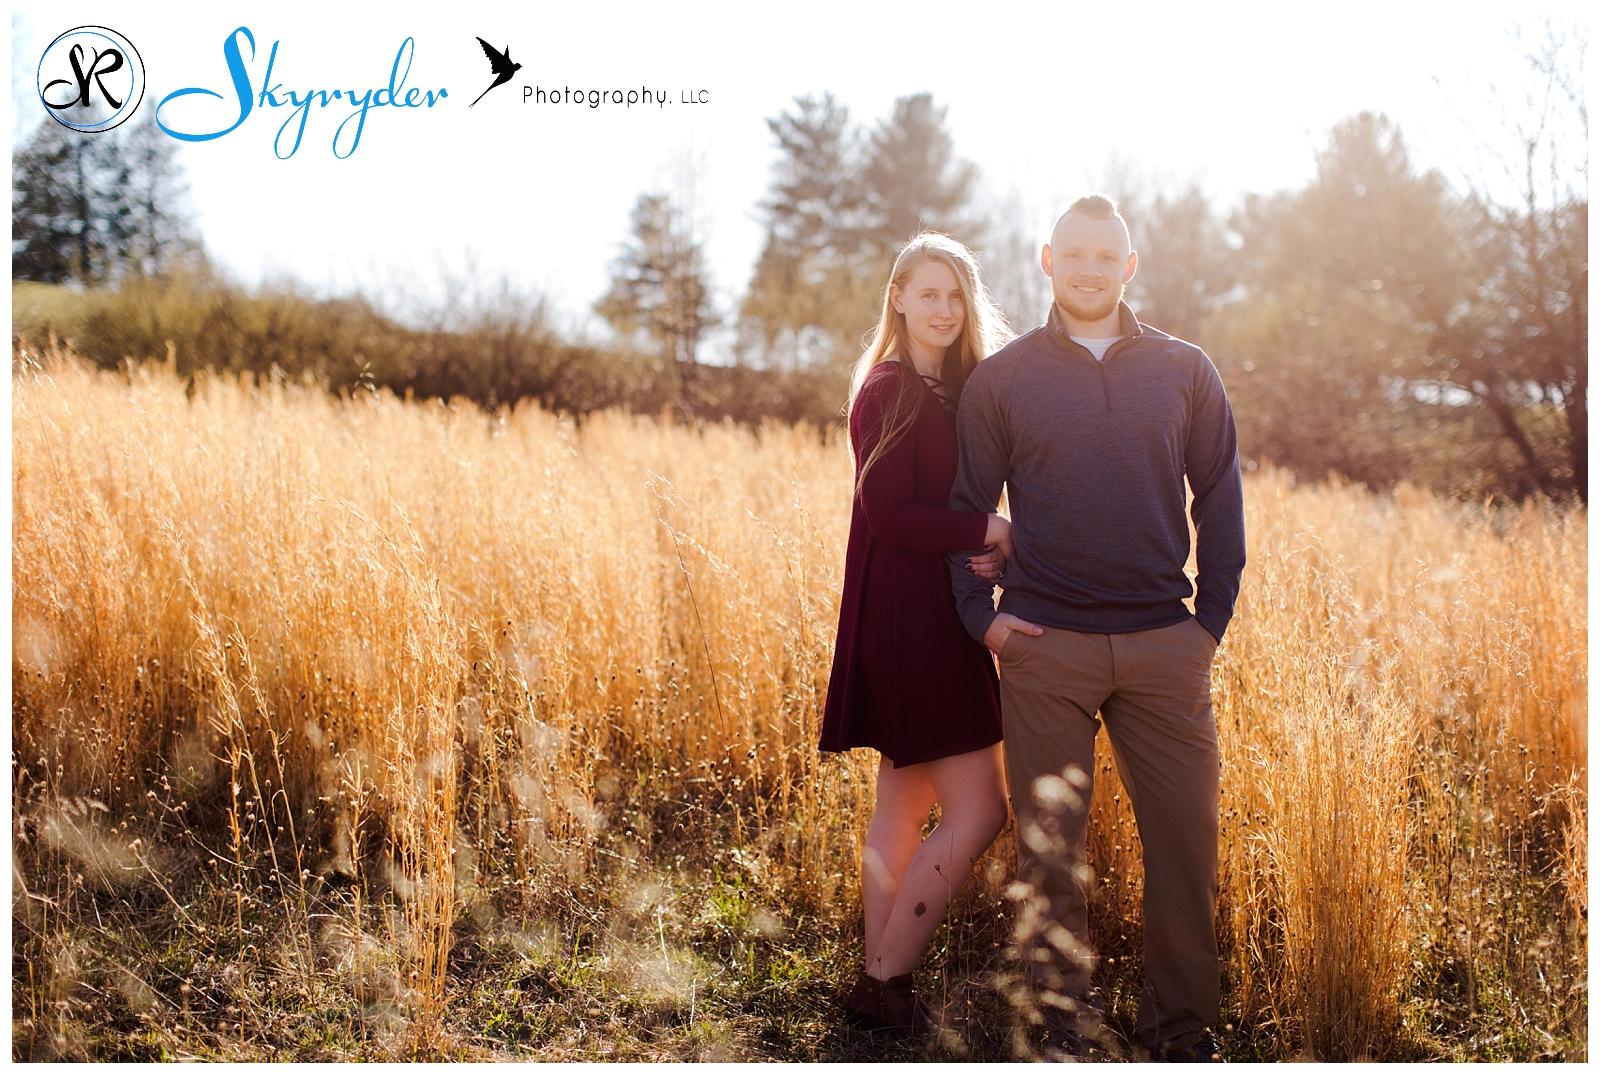 Wedding Season is Almost Here!!! | Blacksburg Wedding Photographer skyryder photography blacksburg lexington charlottesville san francisco wedding photographer